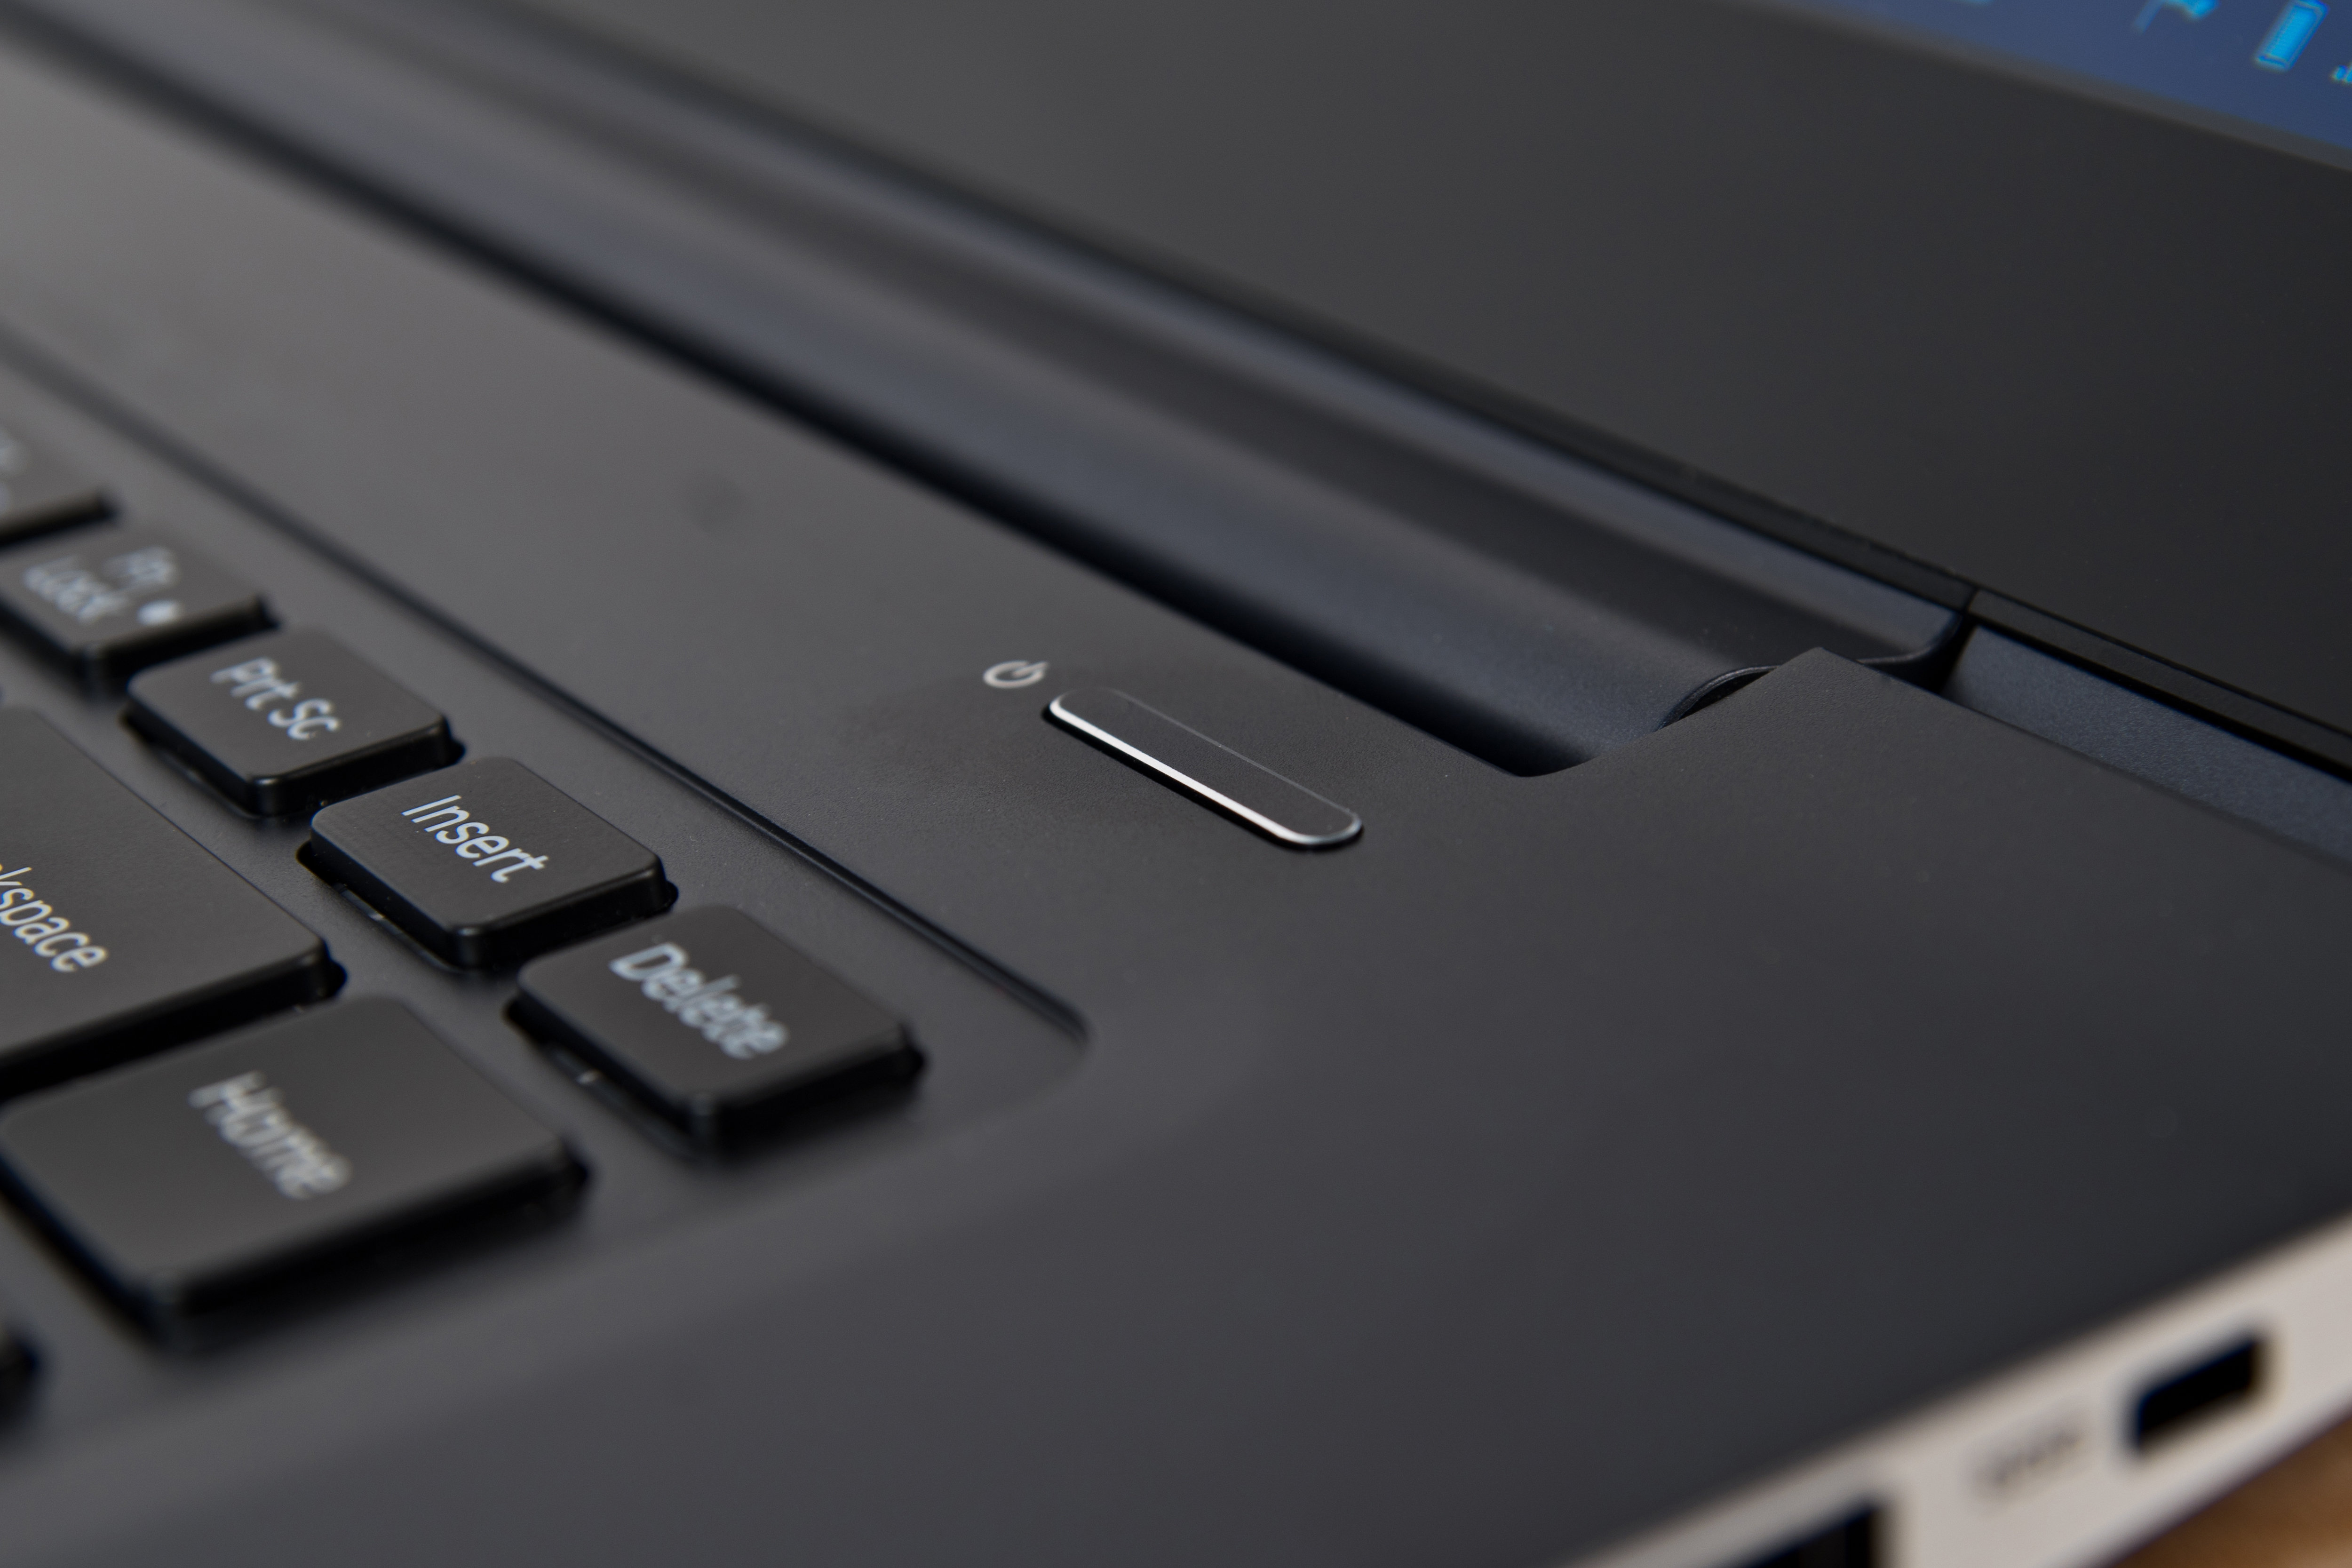 A photograph of the Samsung ATIV Book 9 2014 Edition's power button.